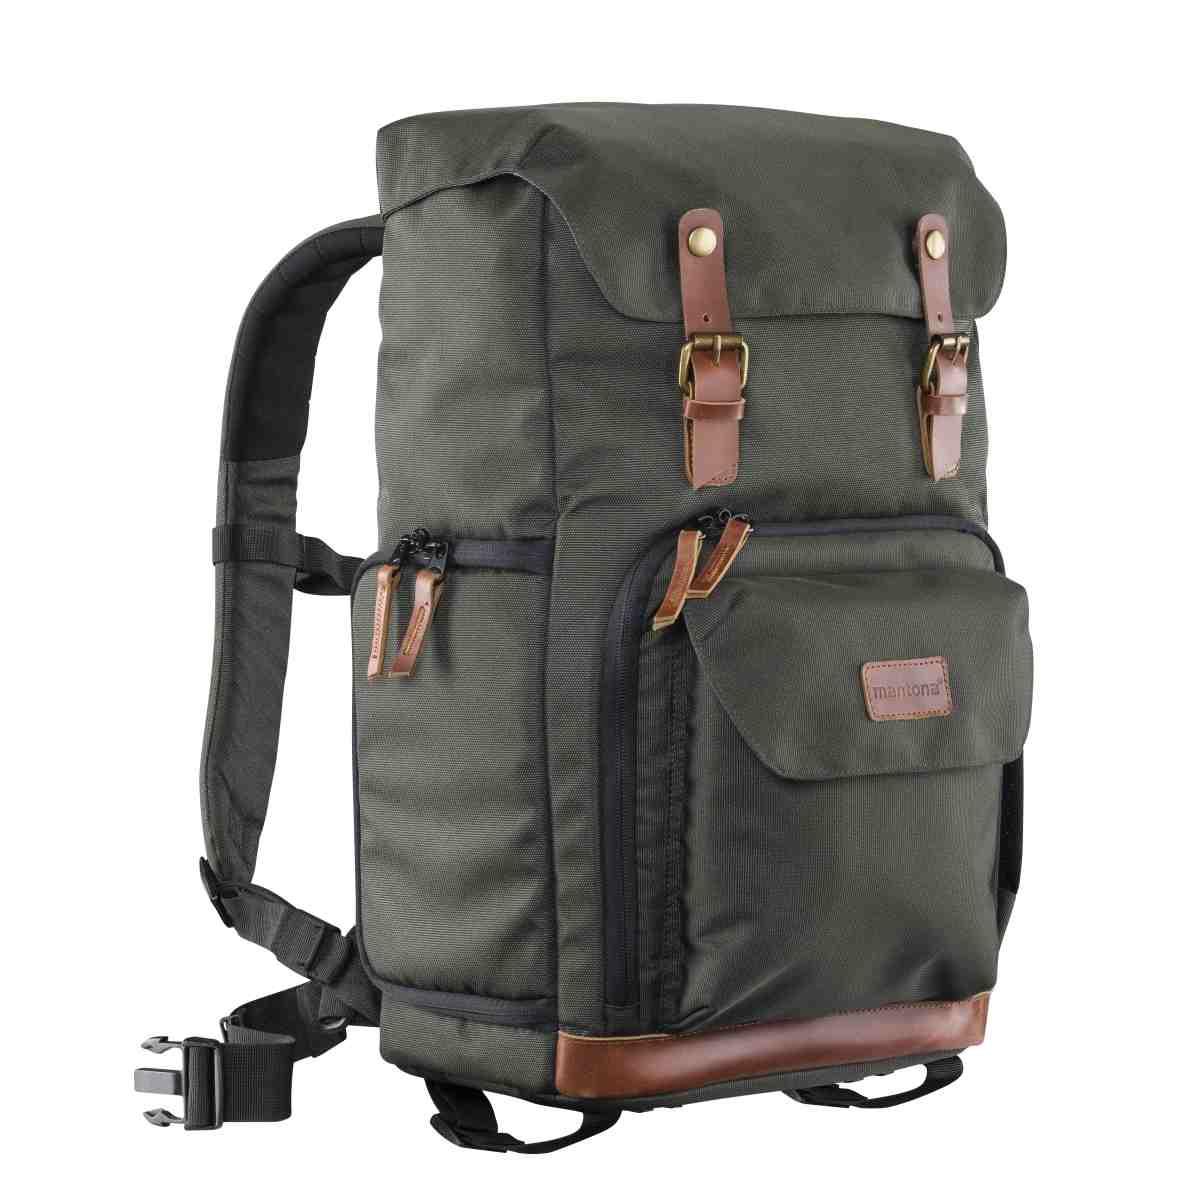 Mantona photo backpack Luis green, retro